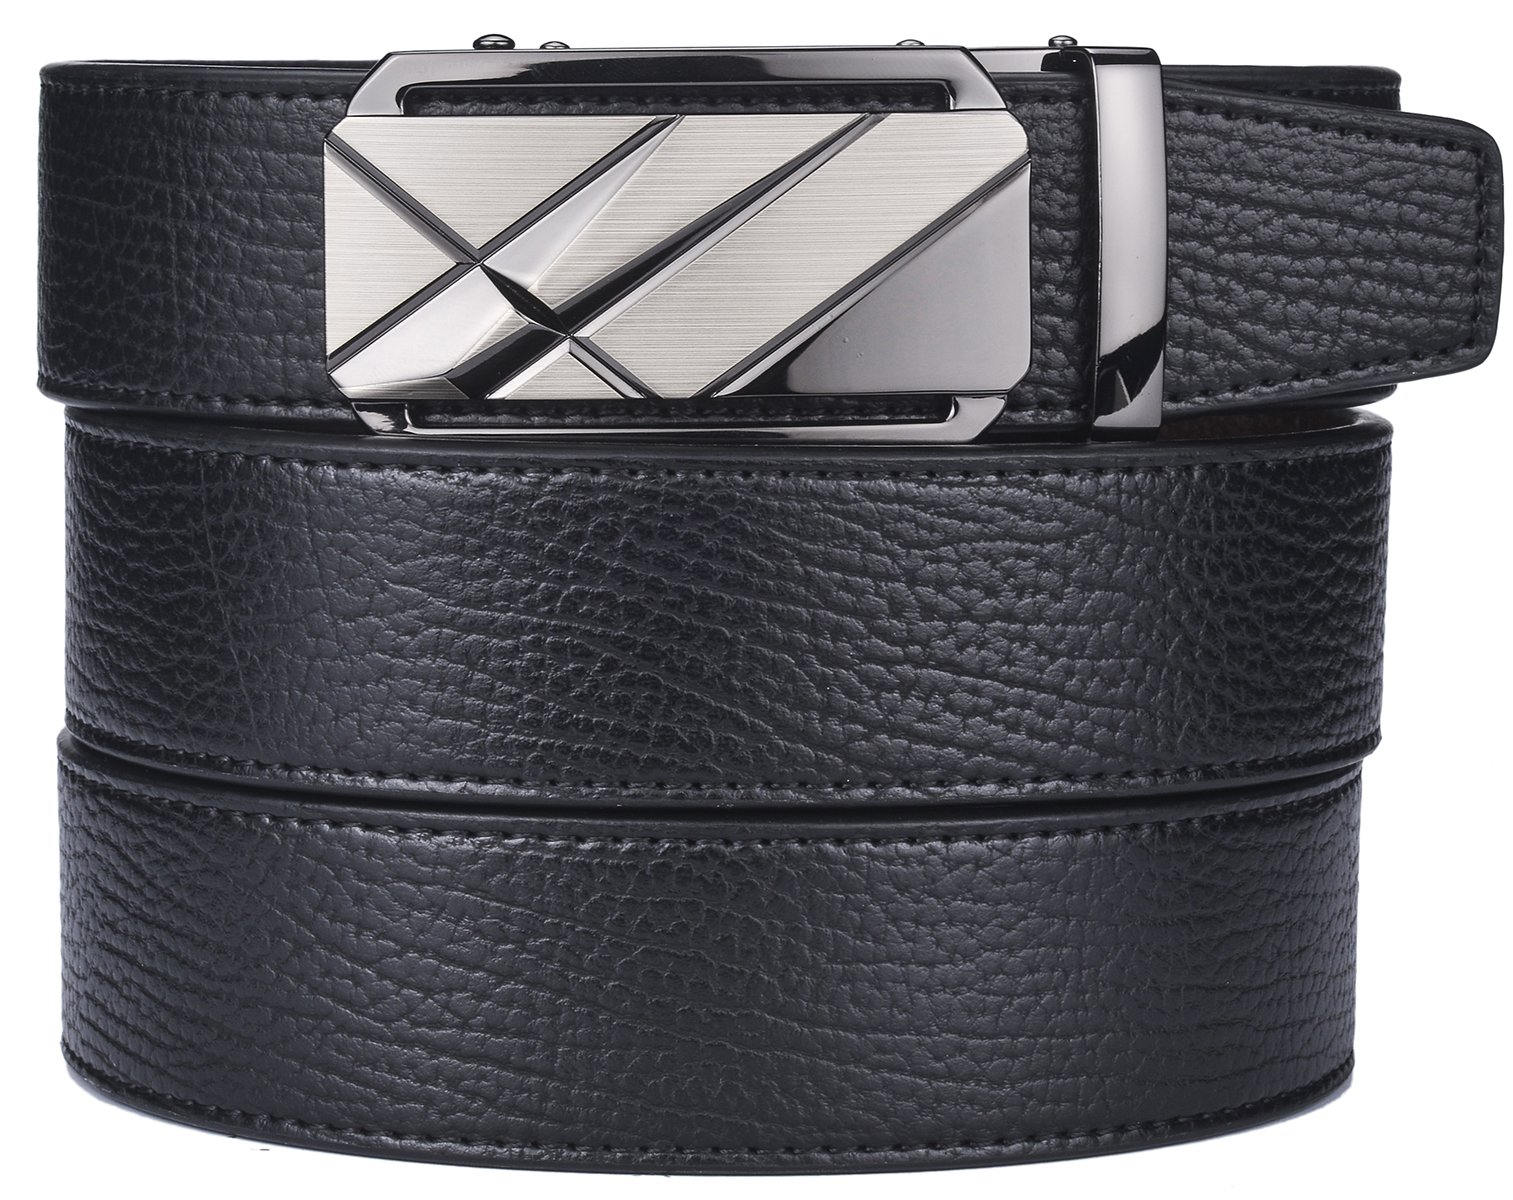 plyesxale Men's Leather Ratchet Dress Belt- Length is Adjustable - Delicate Gift Box (Waist Size:36-44'', Black Belt K120S10)